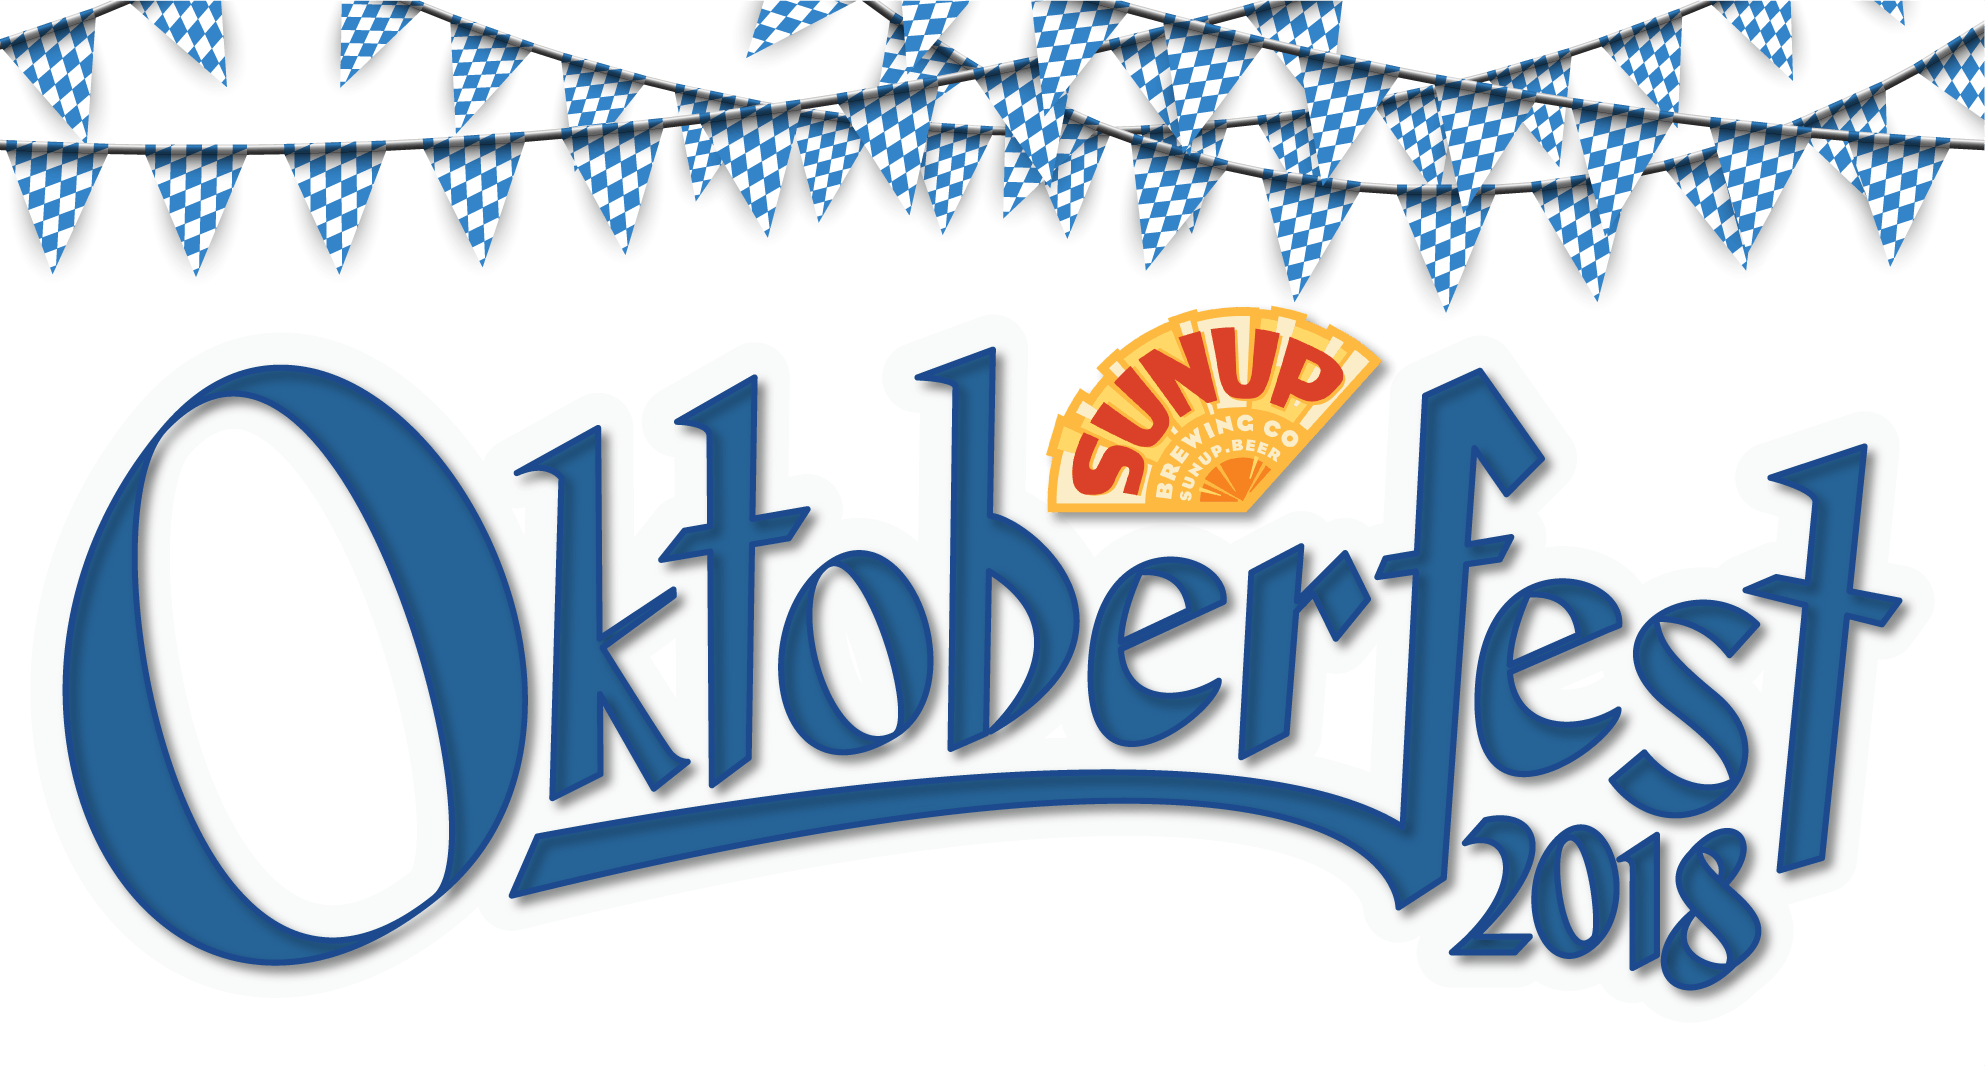 SunUp Brewing Company Oktoberfest